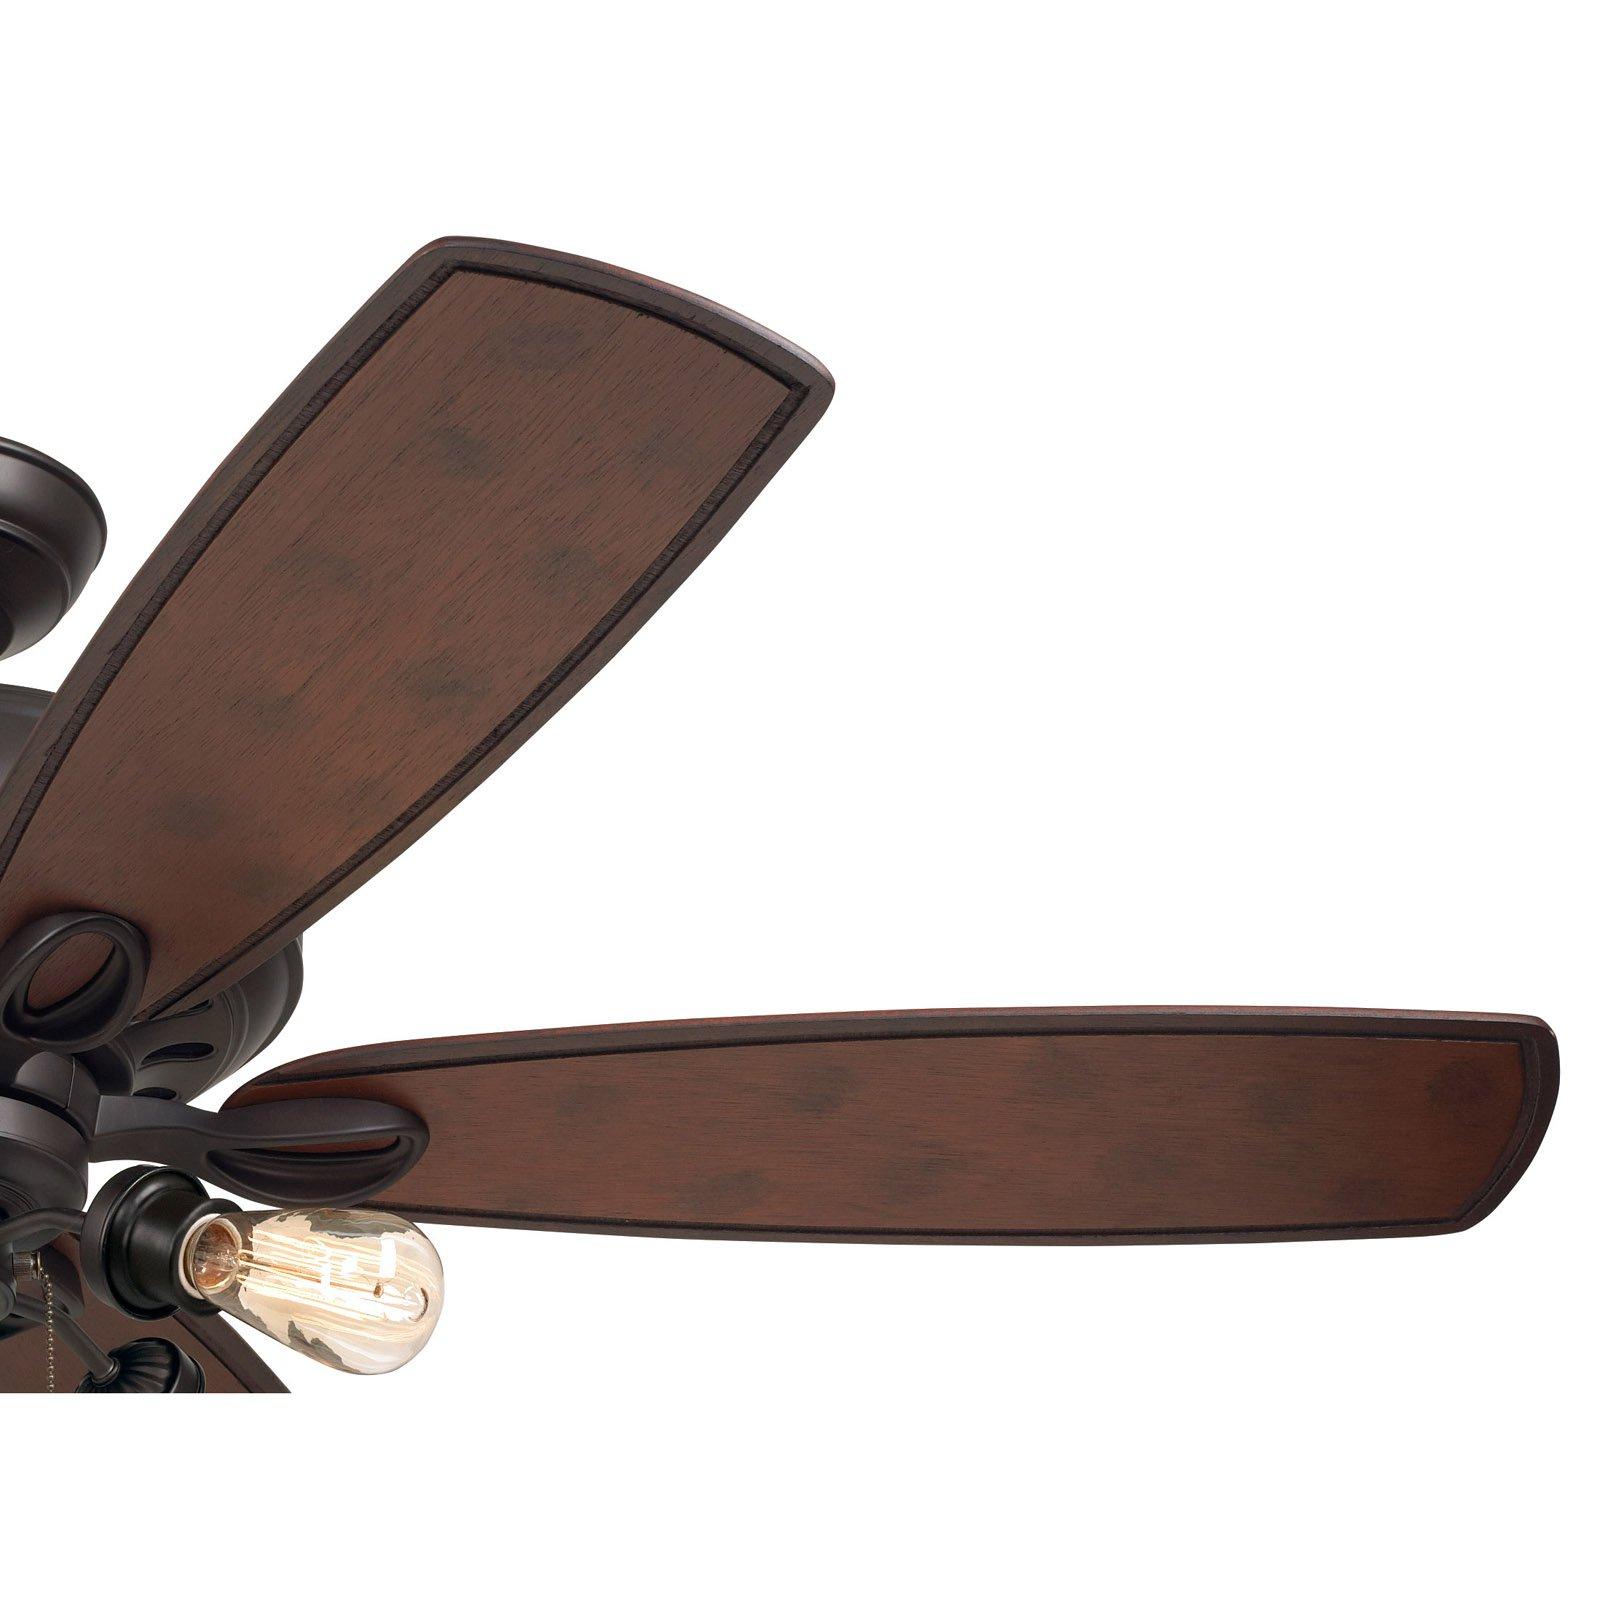 Emerson G54HWA 22 in. Indoor Blades - Set of 5